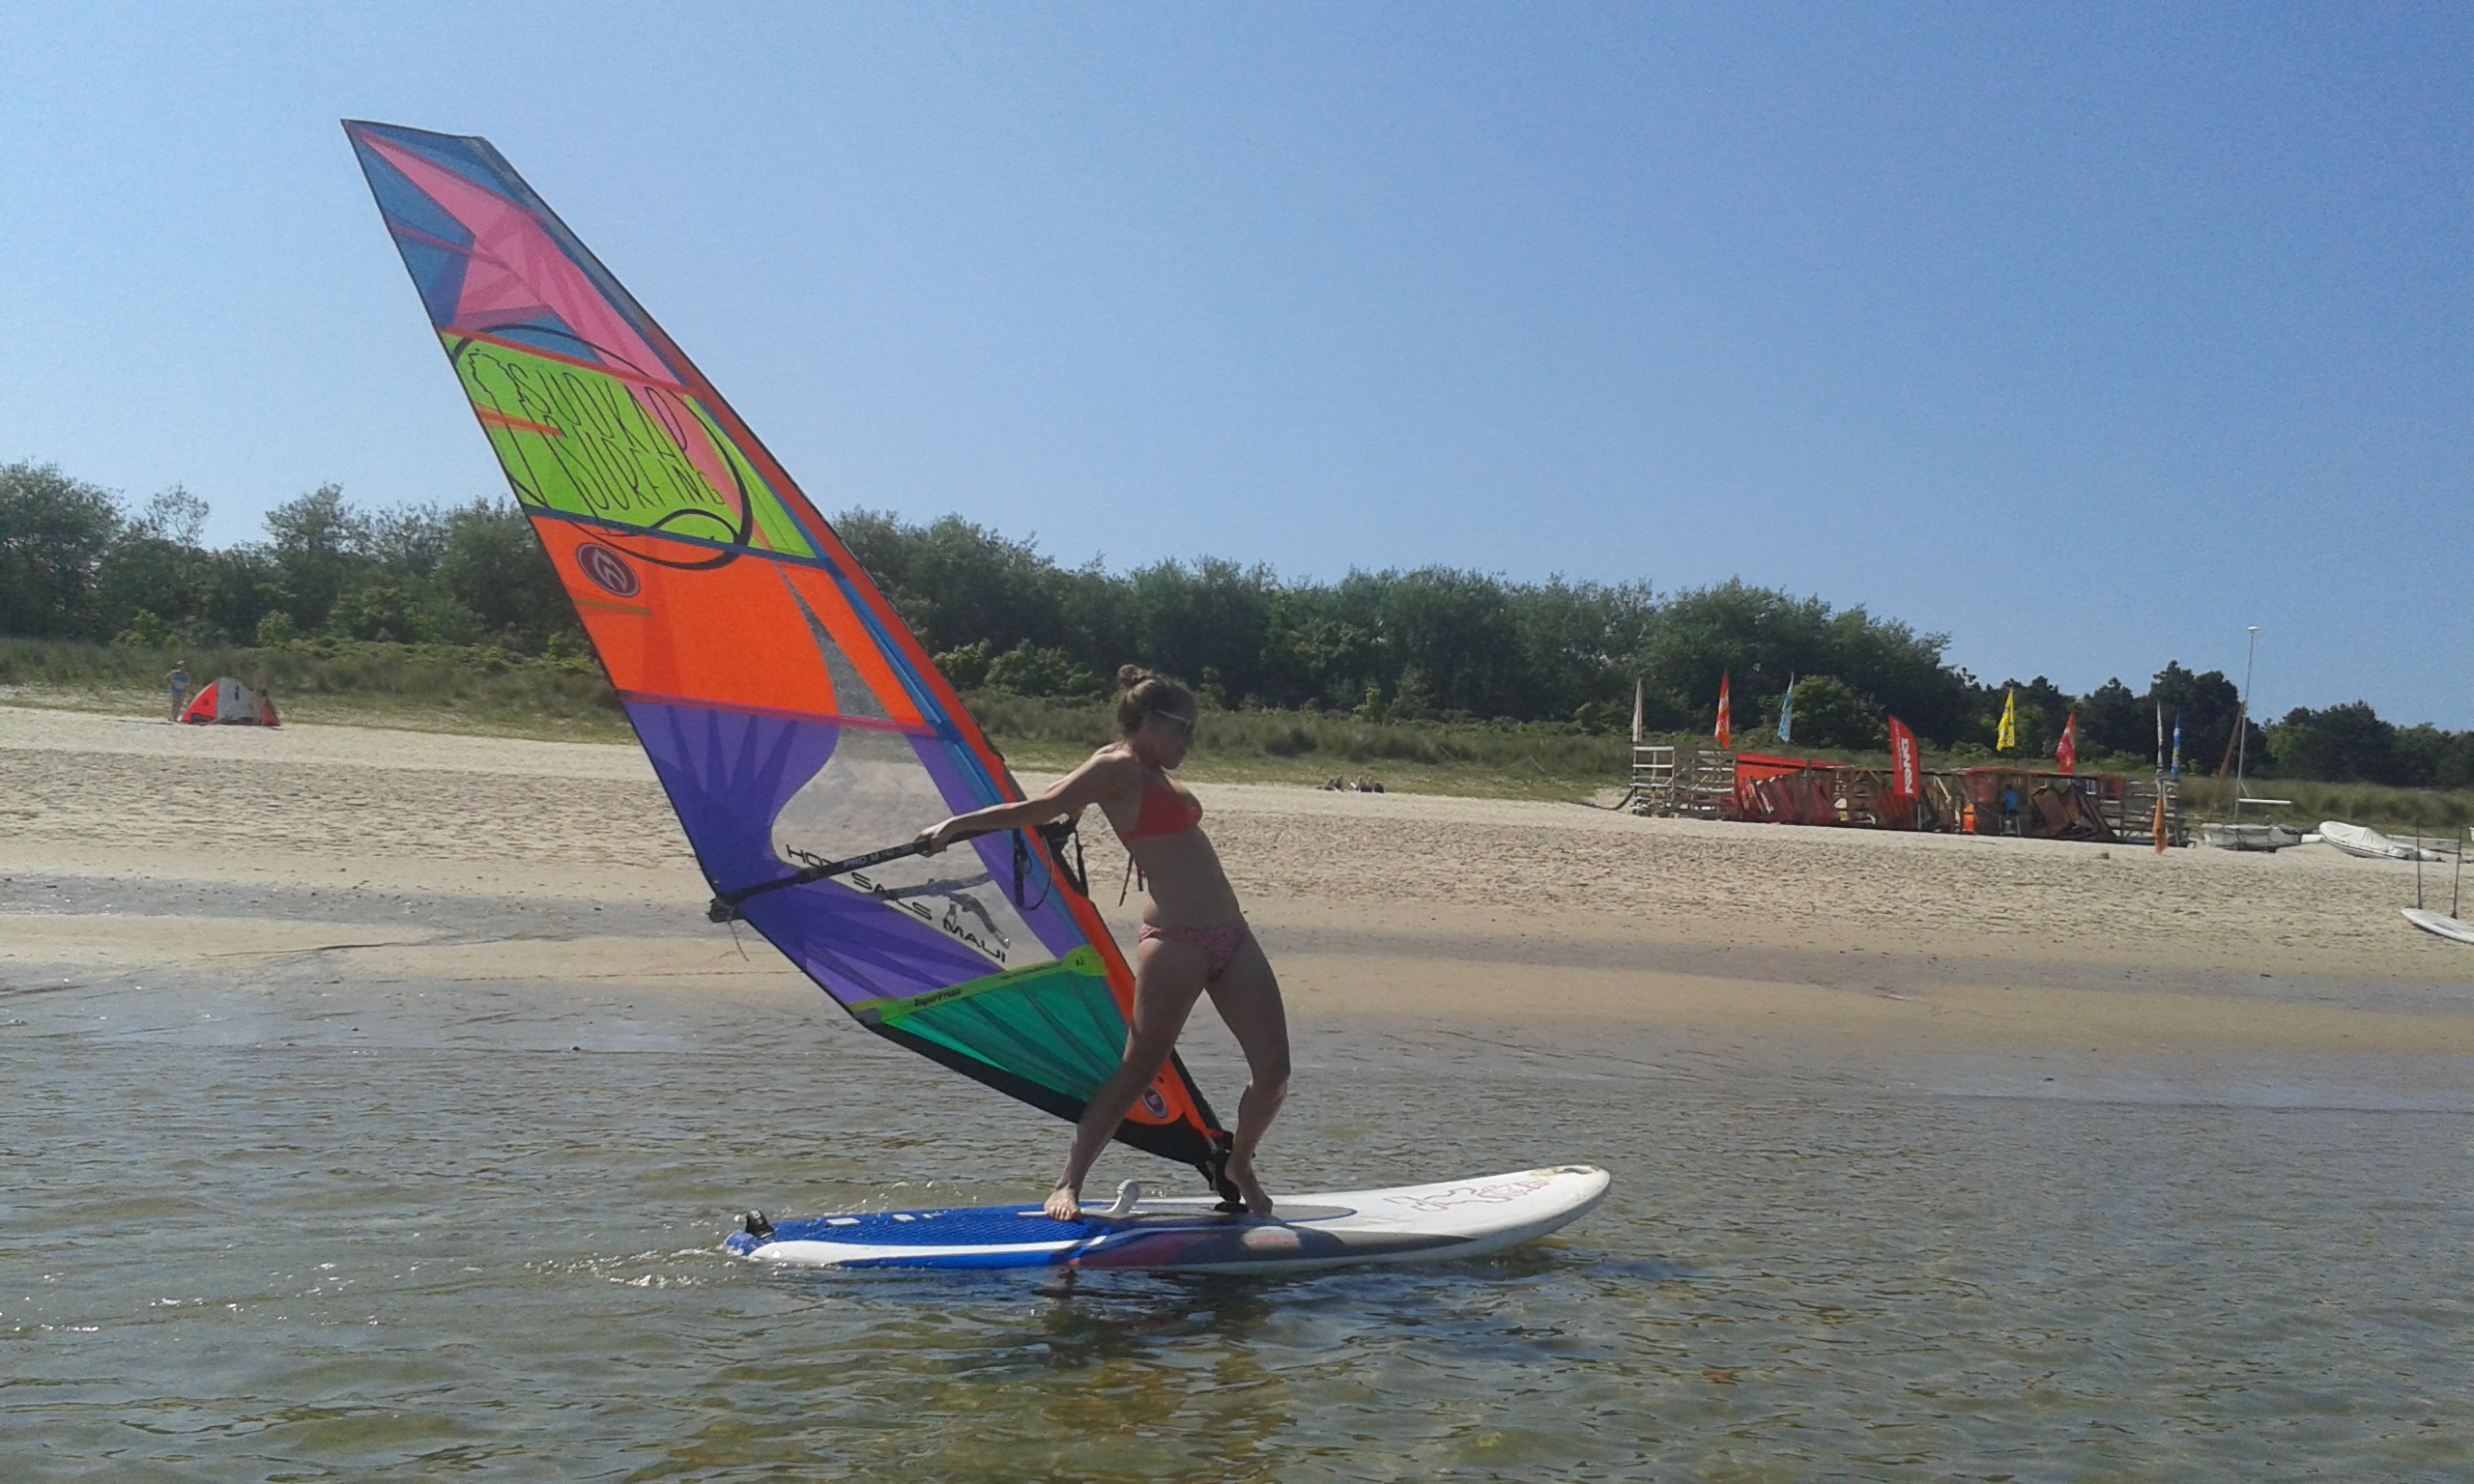 sylt_windsurfen_surfschule (1)